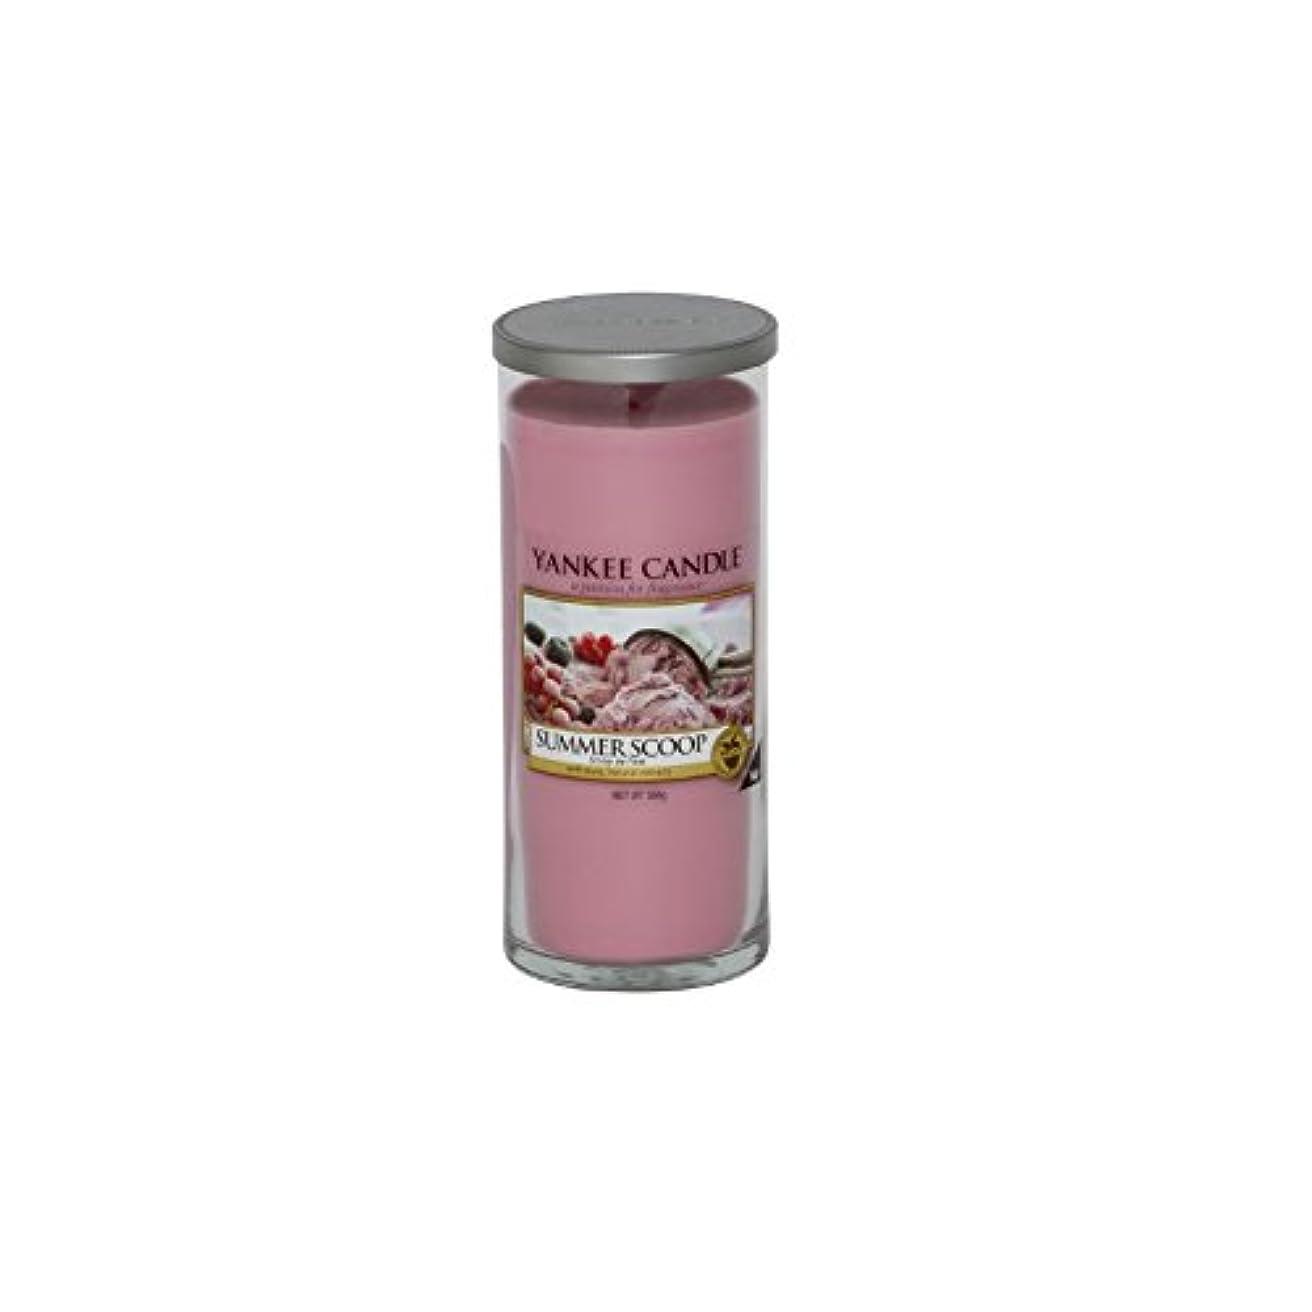 Yankee Candles Large Pillar Candle - Summer Scoop (Pack of 6) - ヤンキーキャンドル大きな柱キャンドル - 夏のスクープ (x6) [並行輸入品]